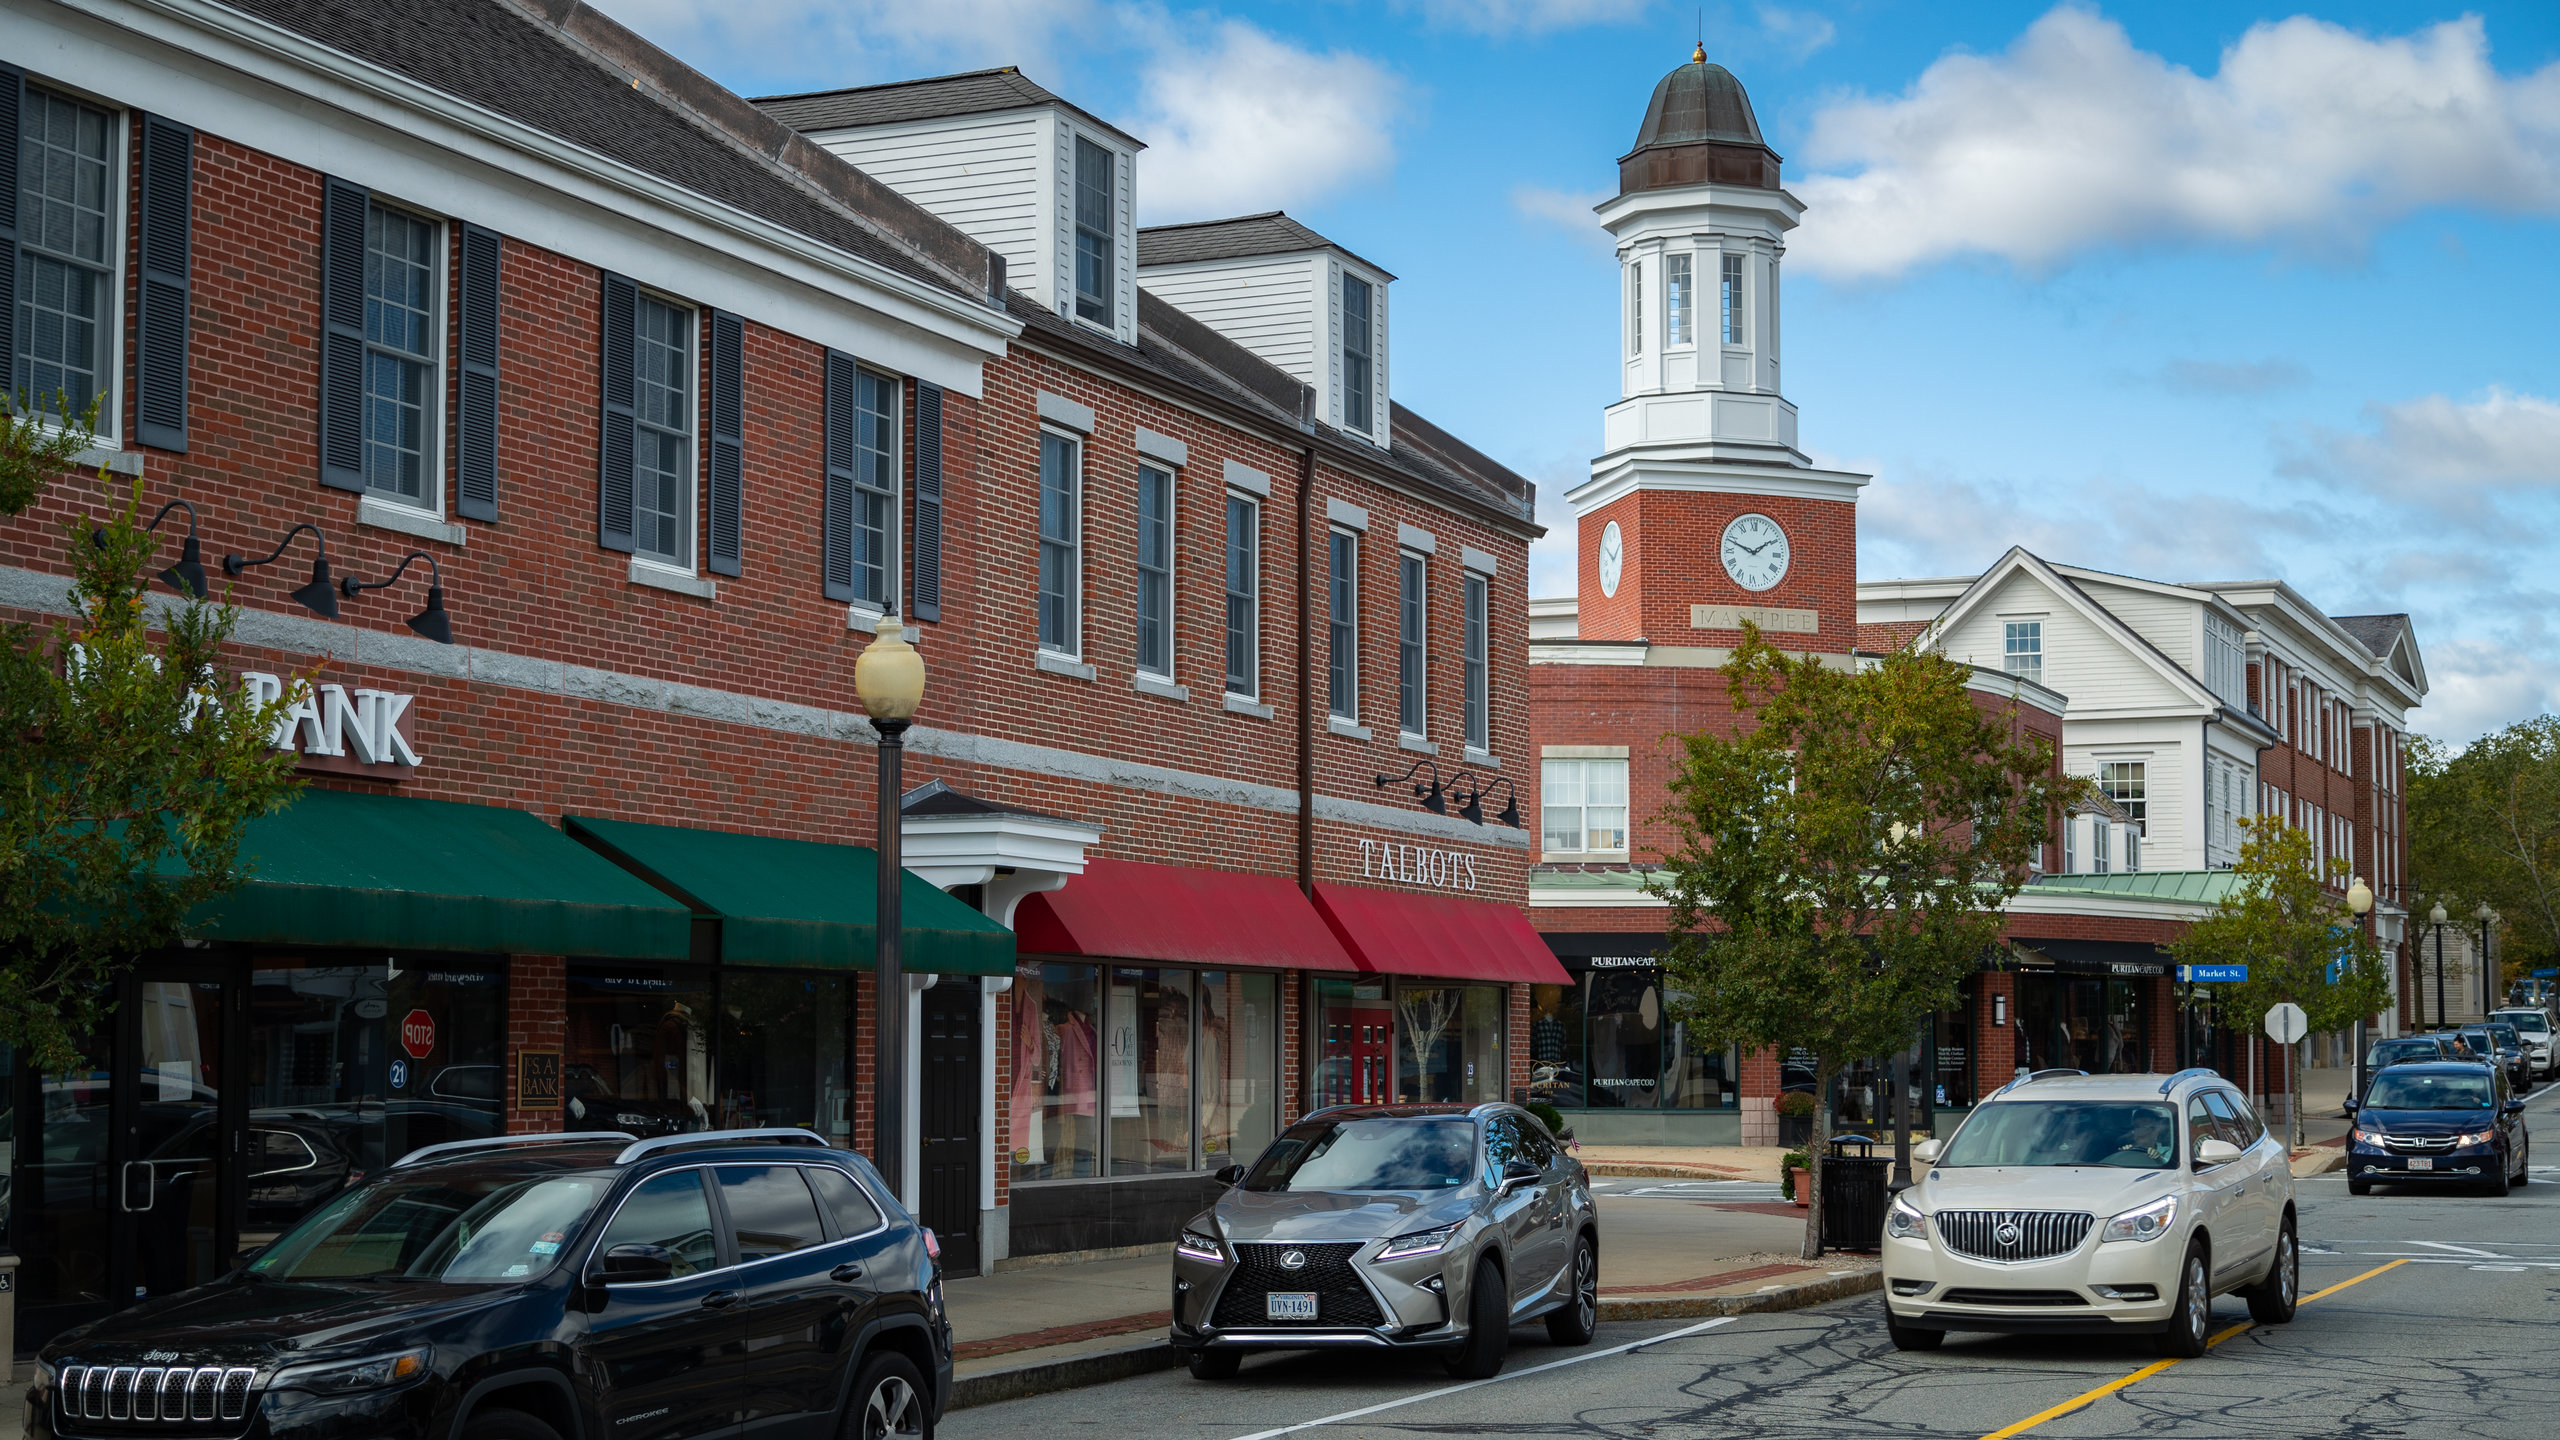 Mashpee, Massachusetts, United States of America